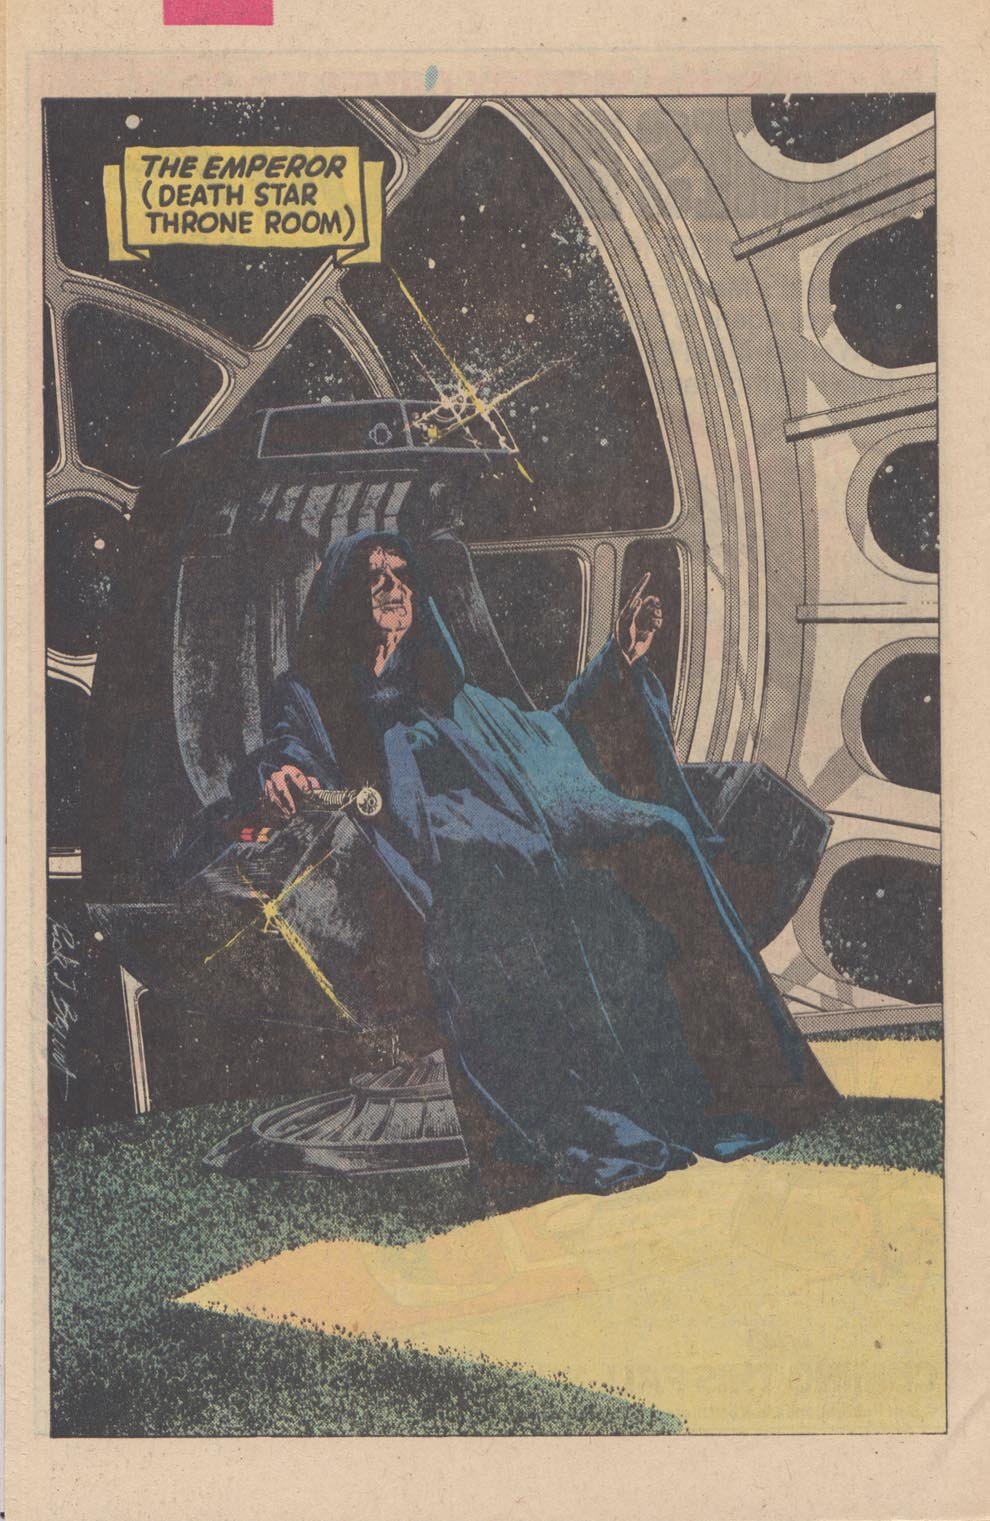 Read online Star Wars: Return of the Jedi comic -  Issue #3 - 24